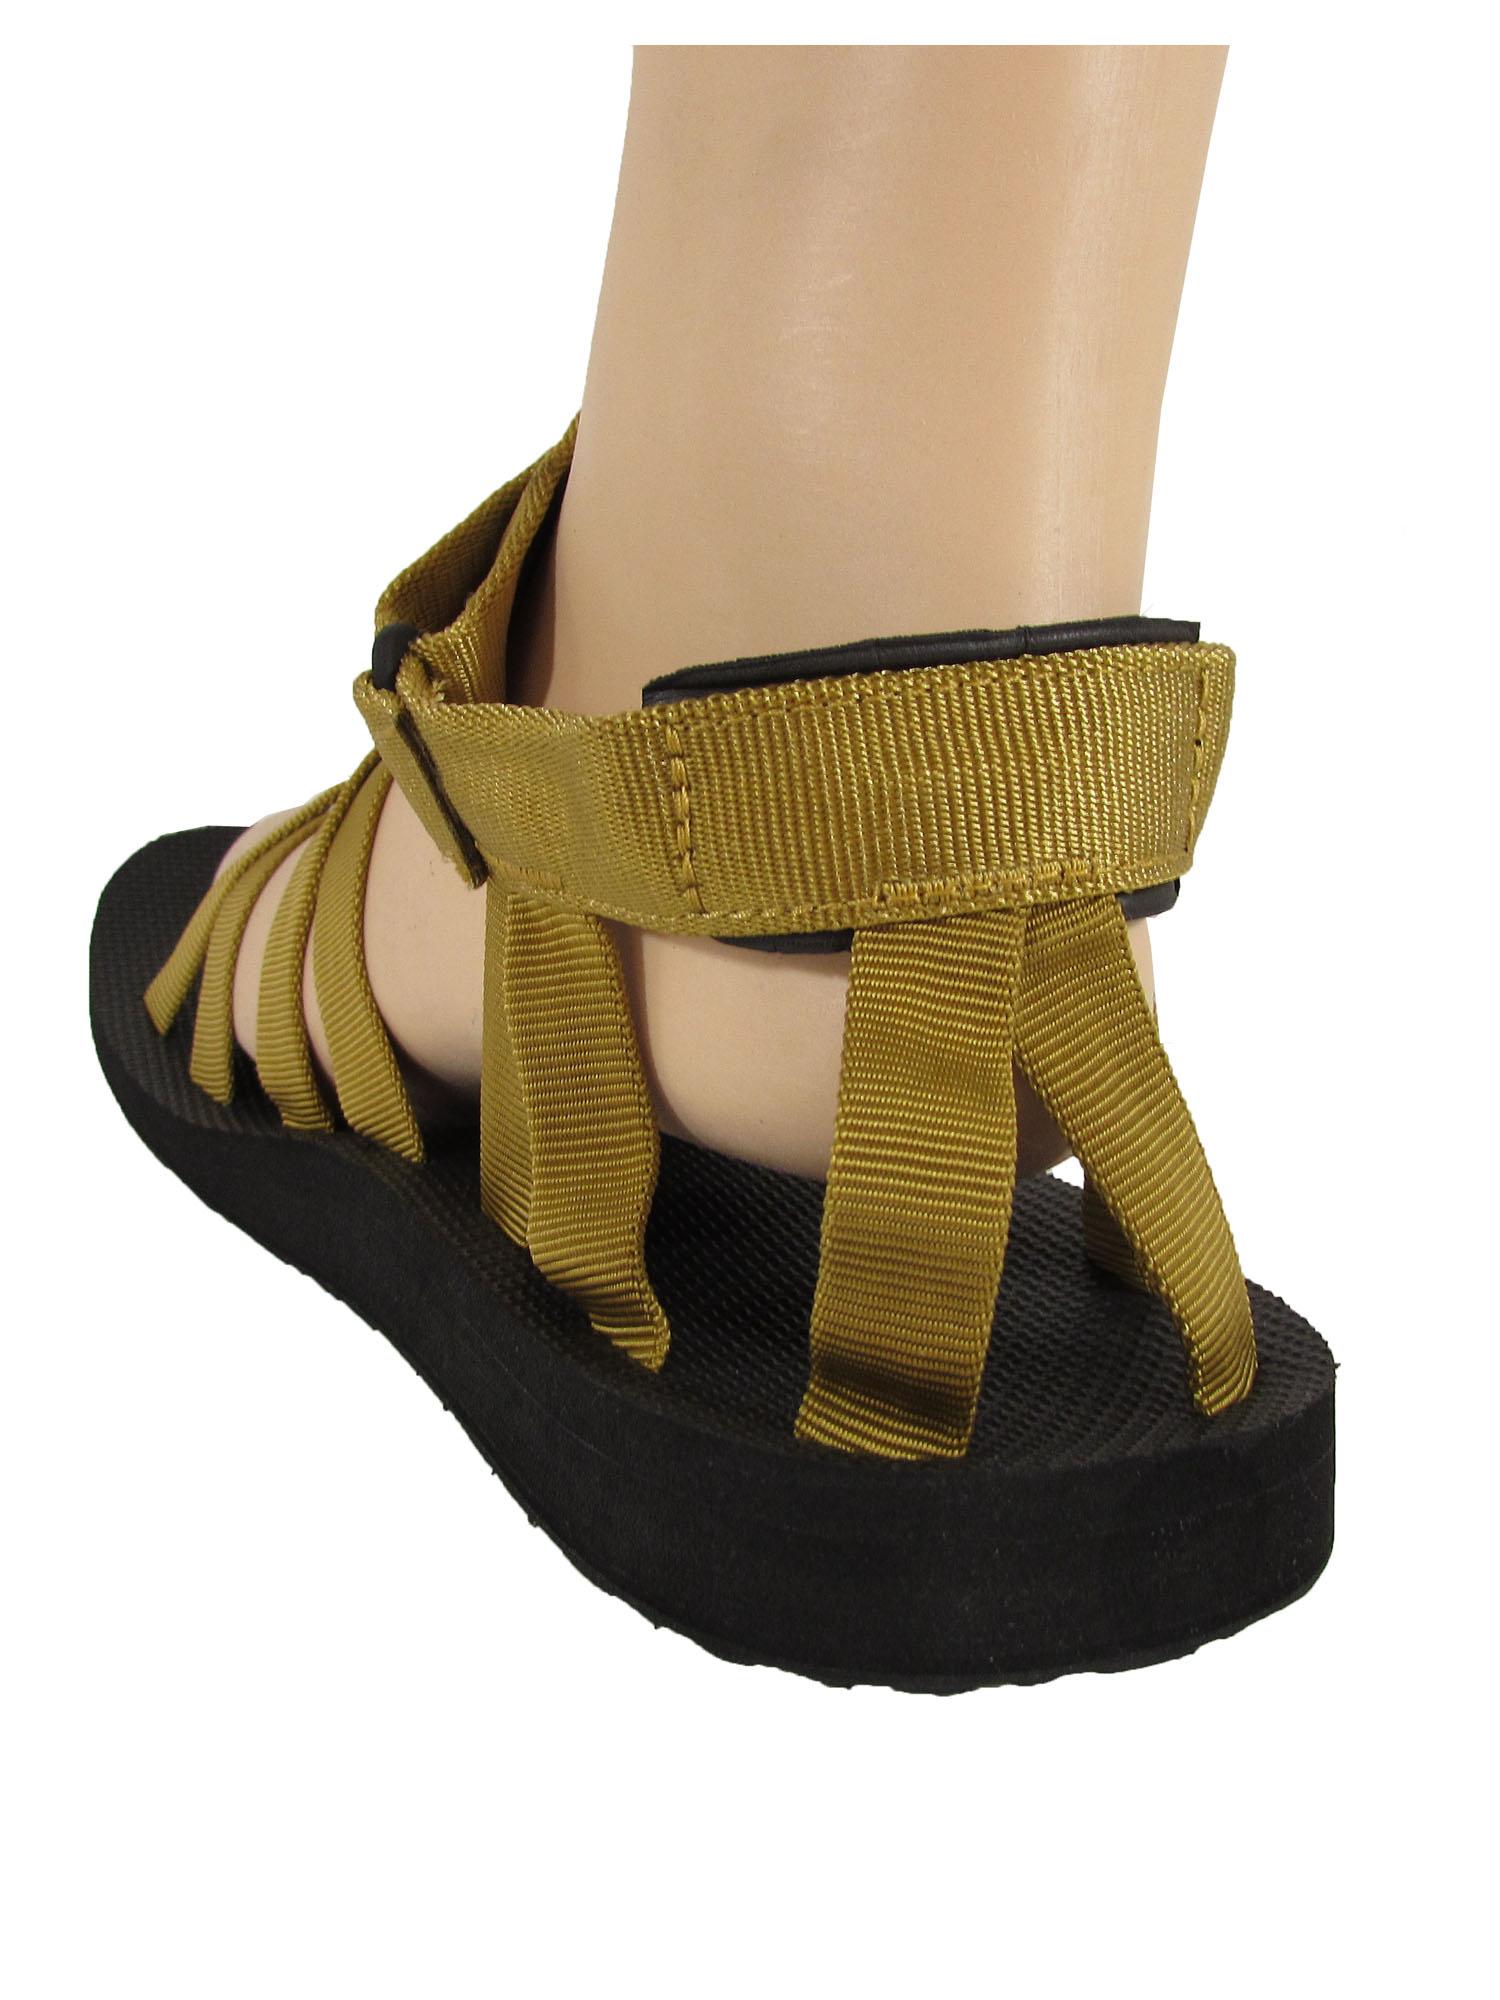 Teva Mens Alp Retro Sporty Water Sandal Shoes